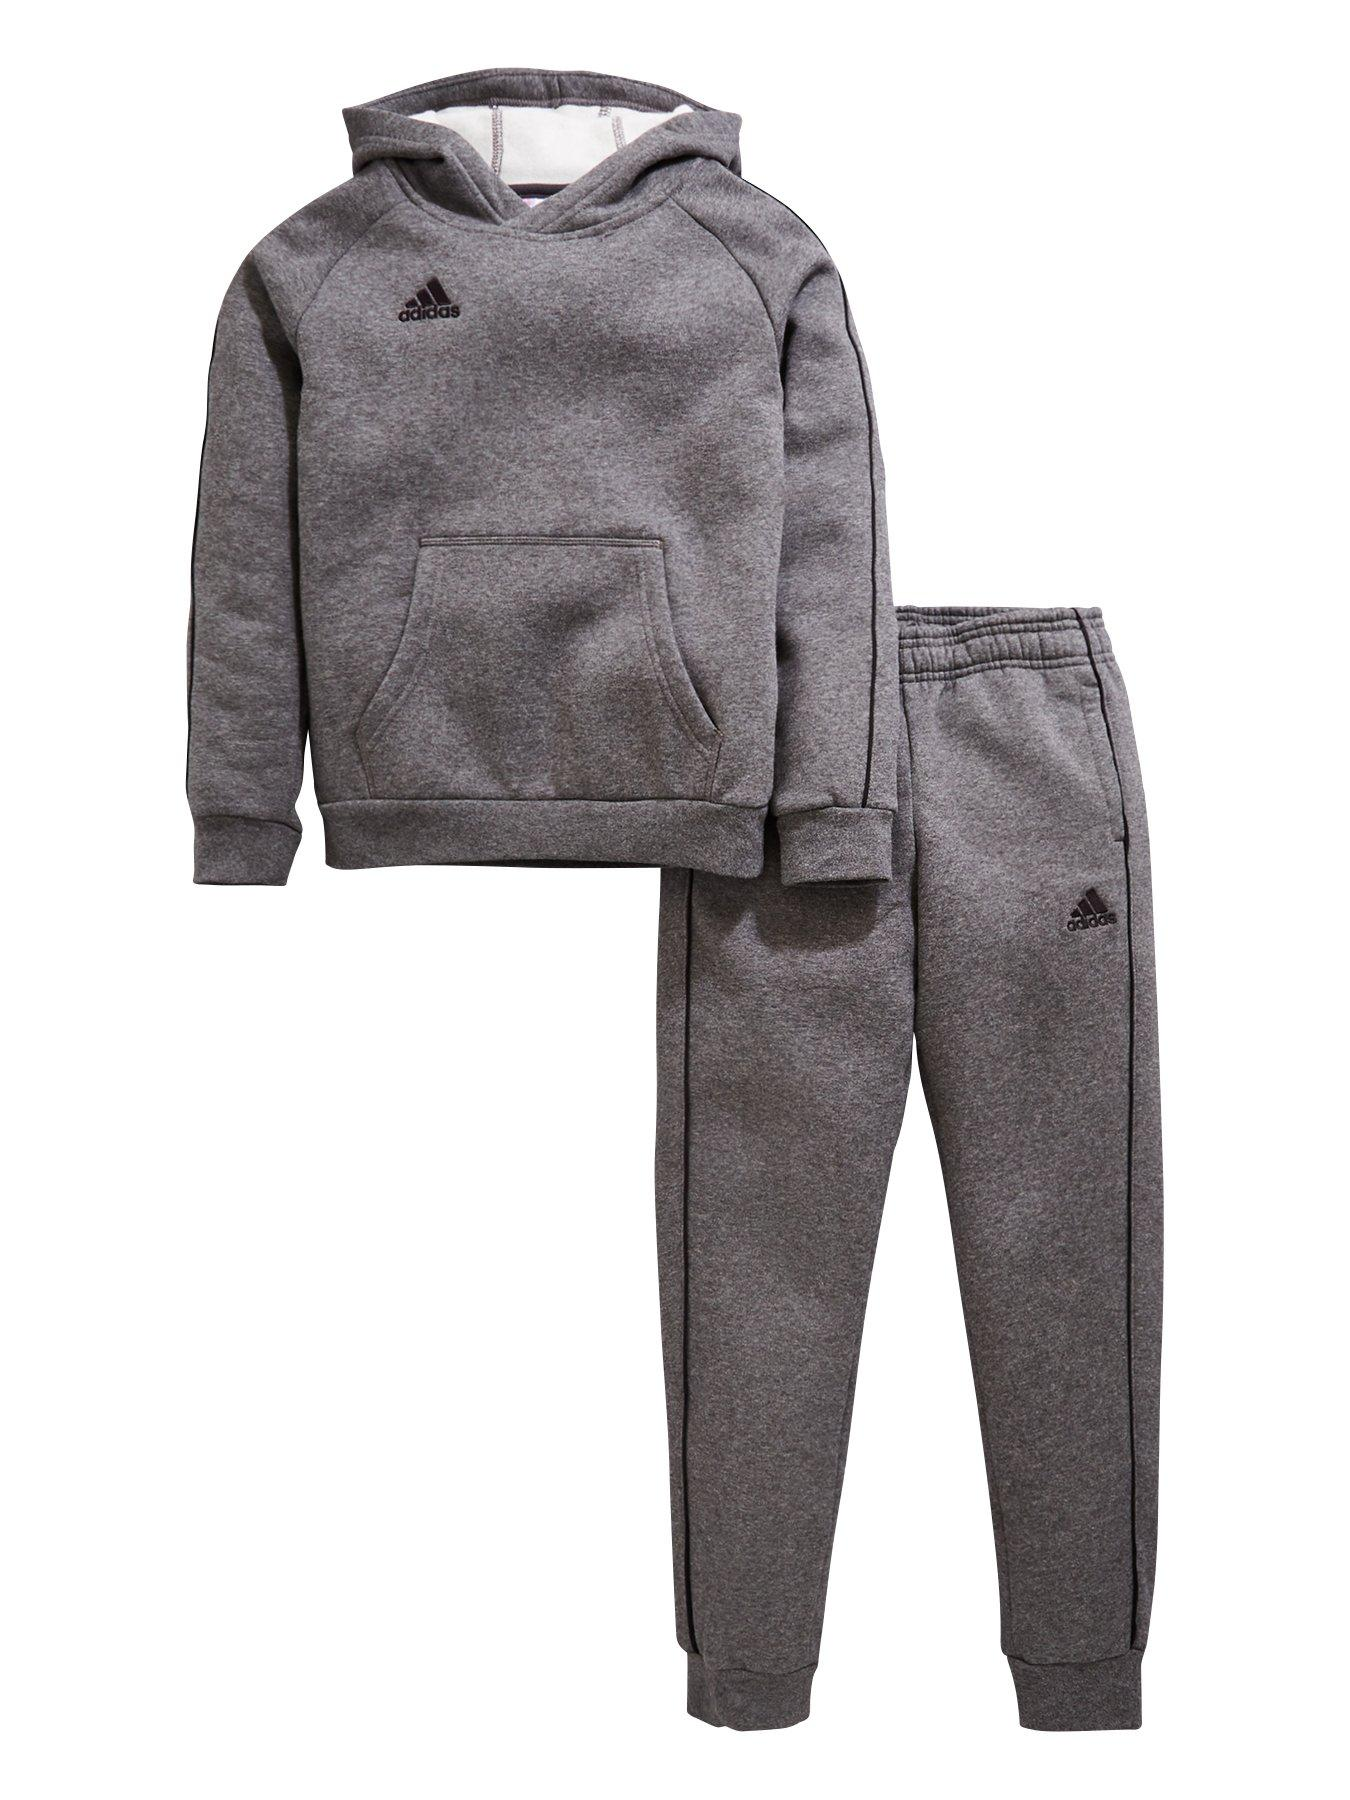 Hot Bargains! 18% Off Adidas Originals Superstar Track Pants